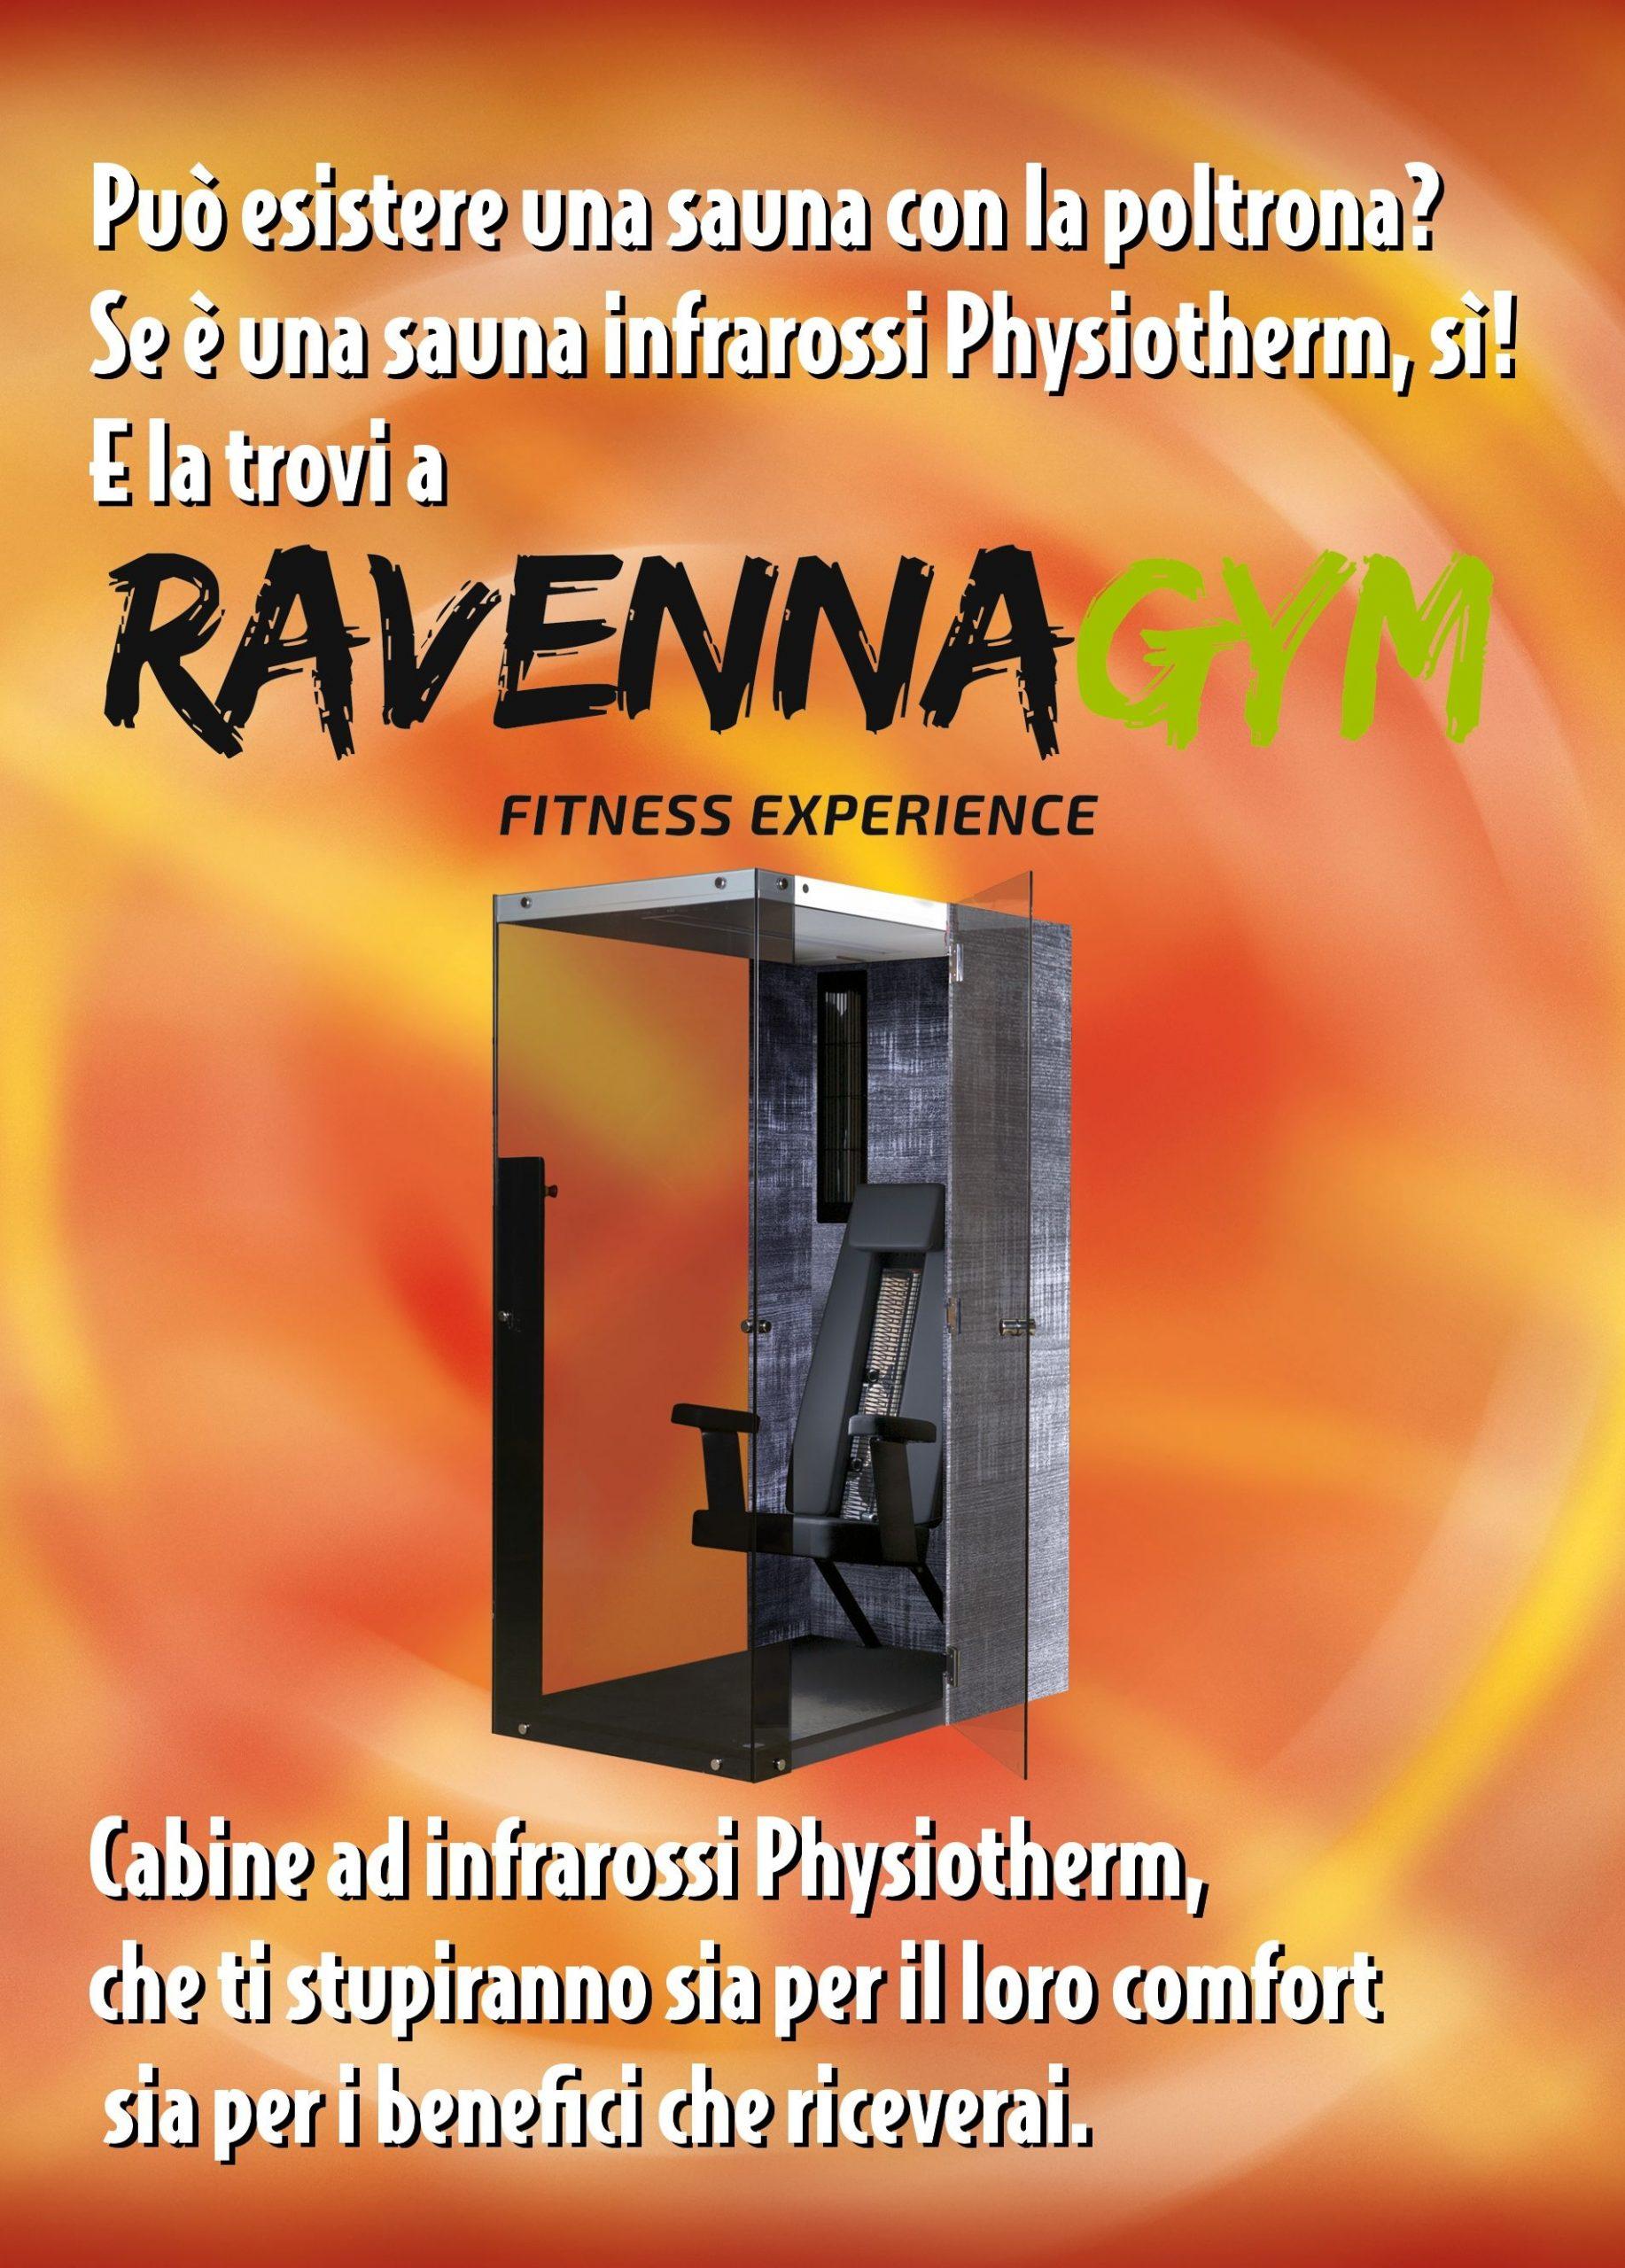 Volantino Saune Infrarossi Physiotherm con Ravenna Gym ed Effetto Vita